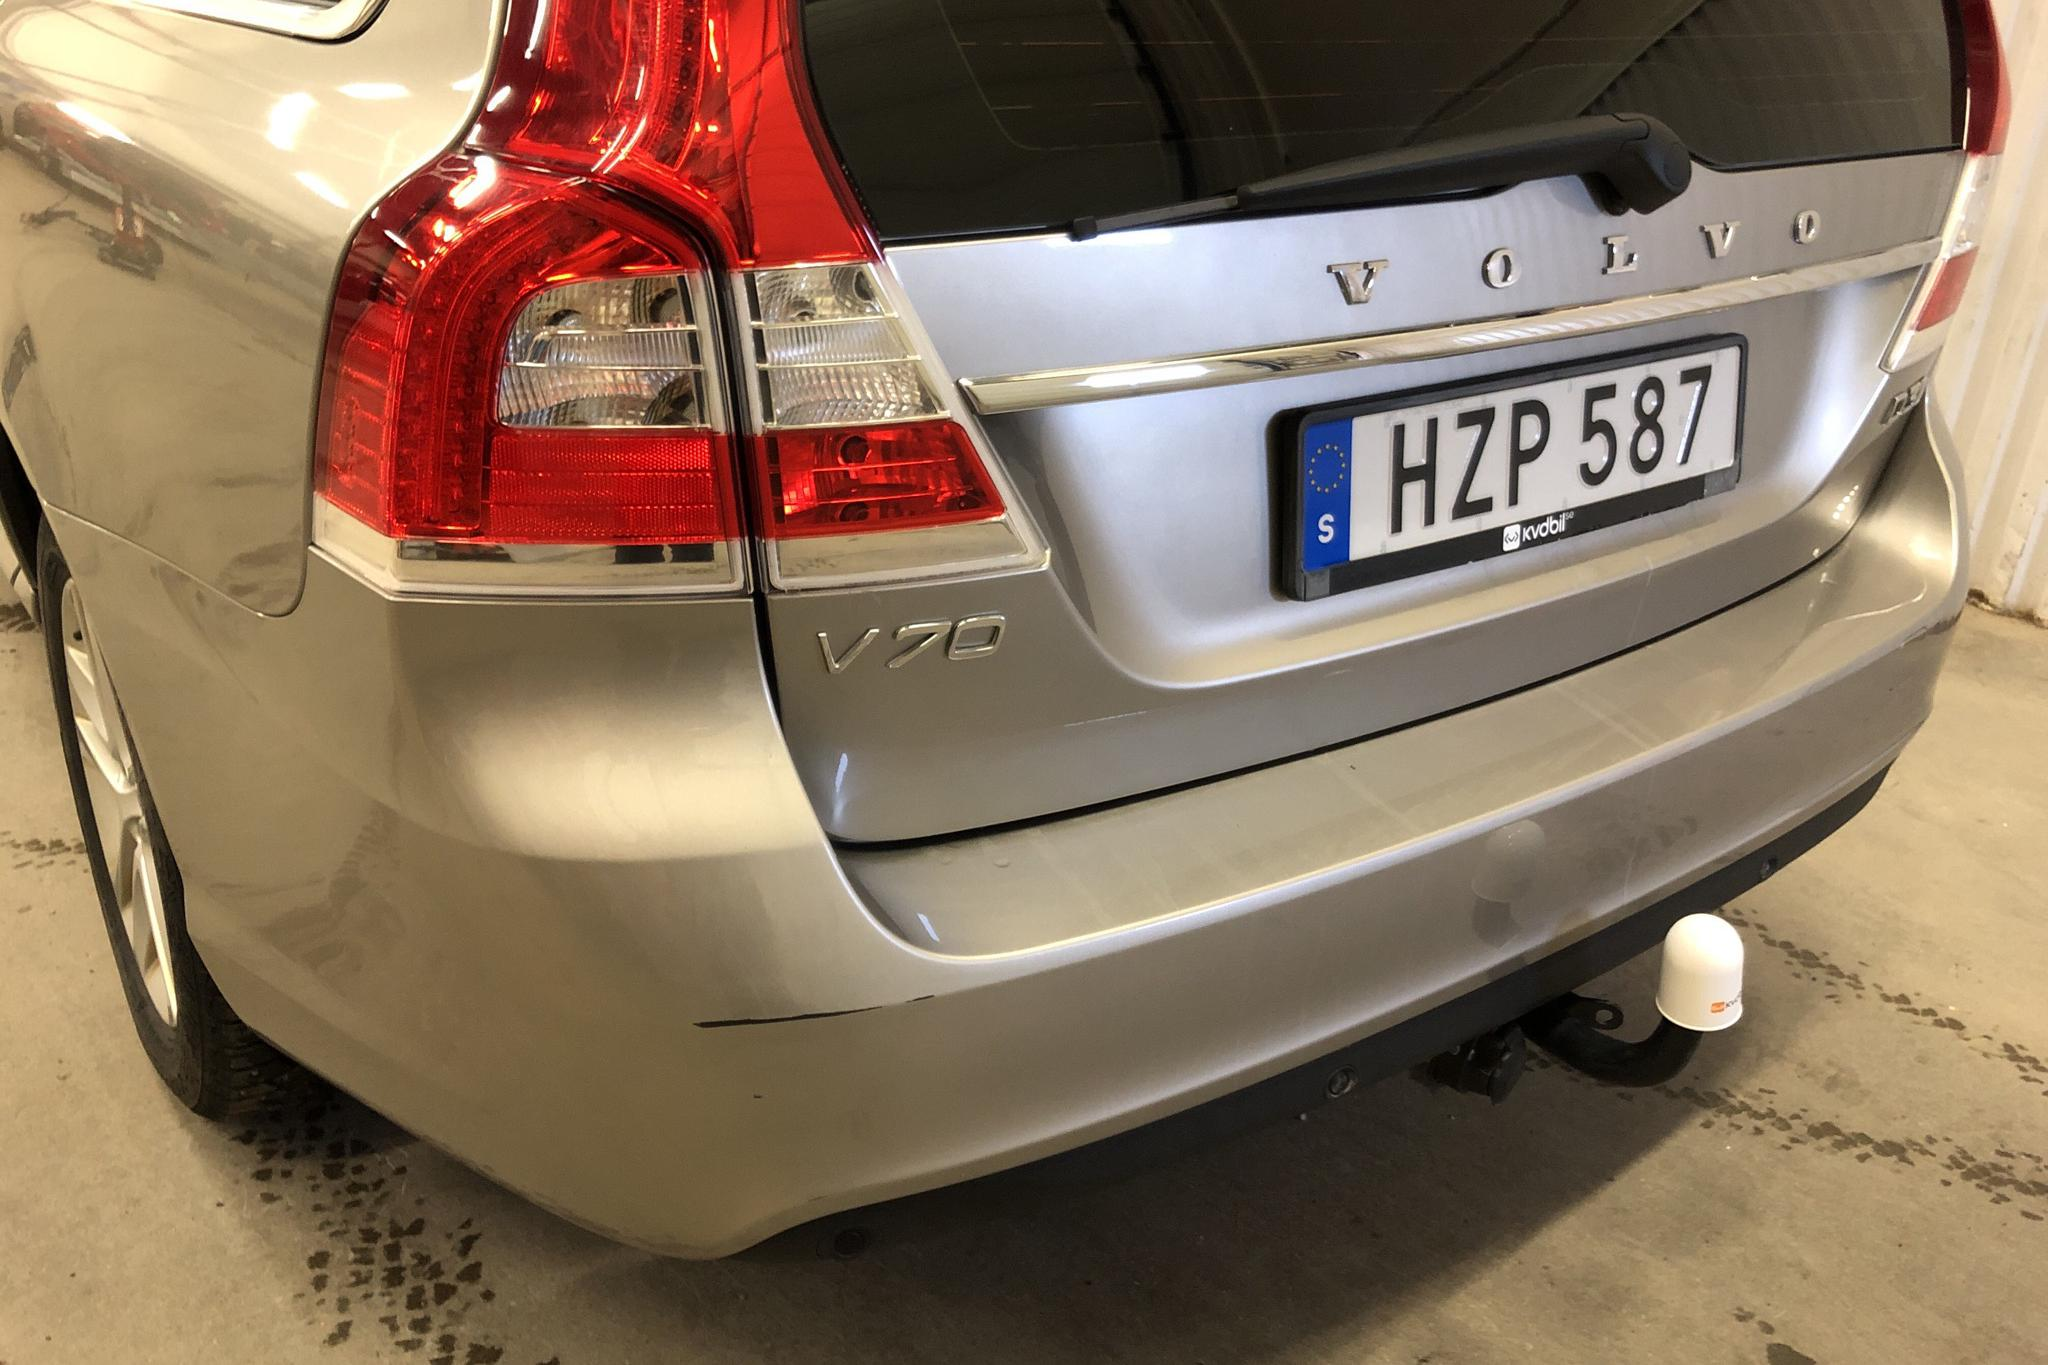 Volvo V70 II D3 (150hk) - 176 070 km - Automatic - Light Brown - 2016